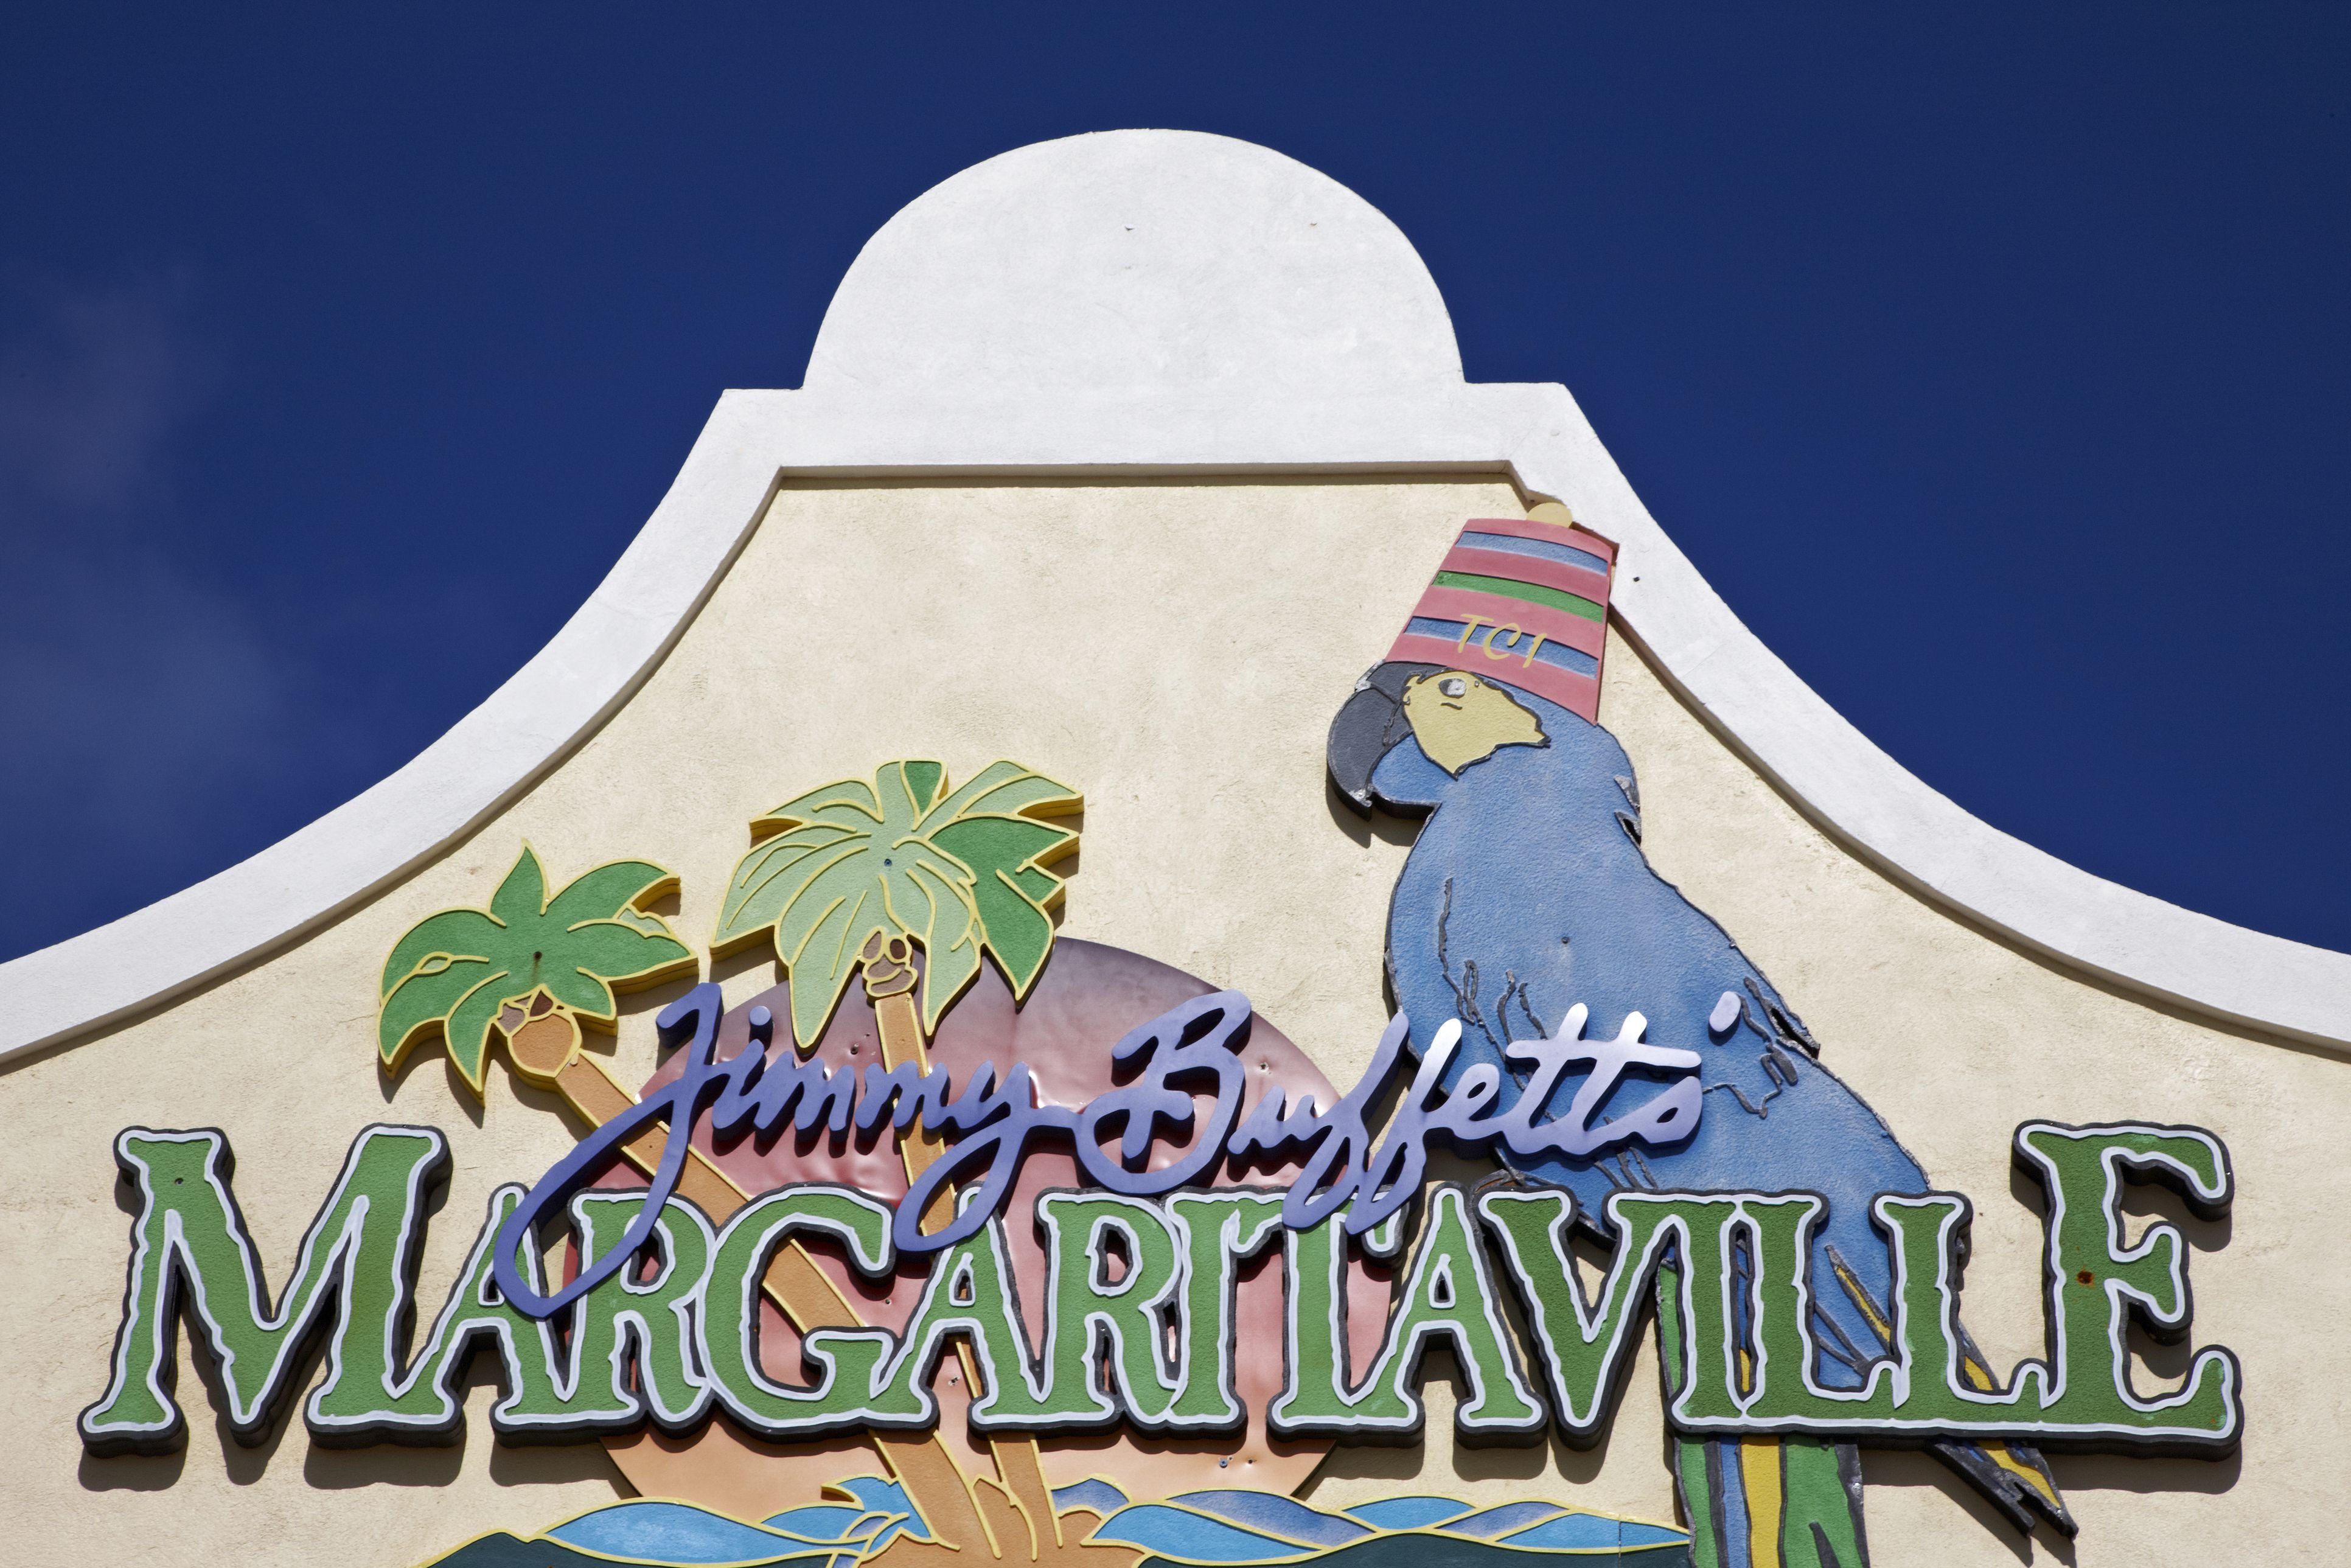 Jimmy Buffetts Margaritaville